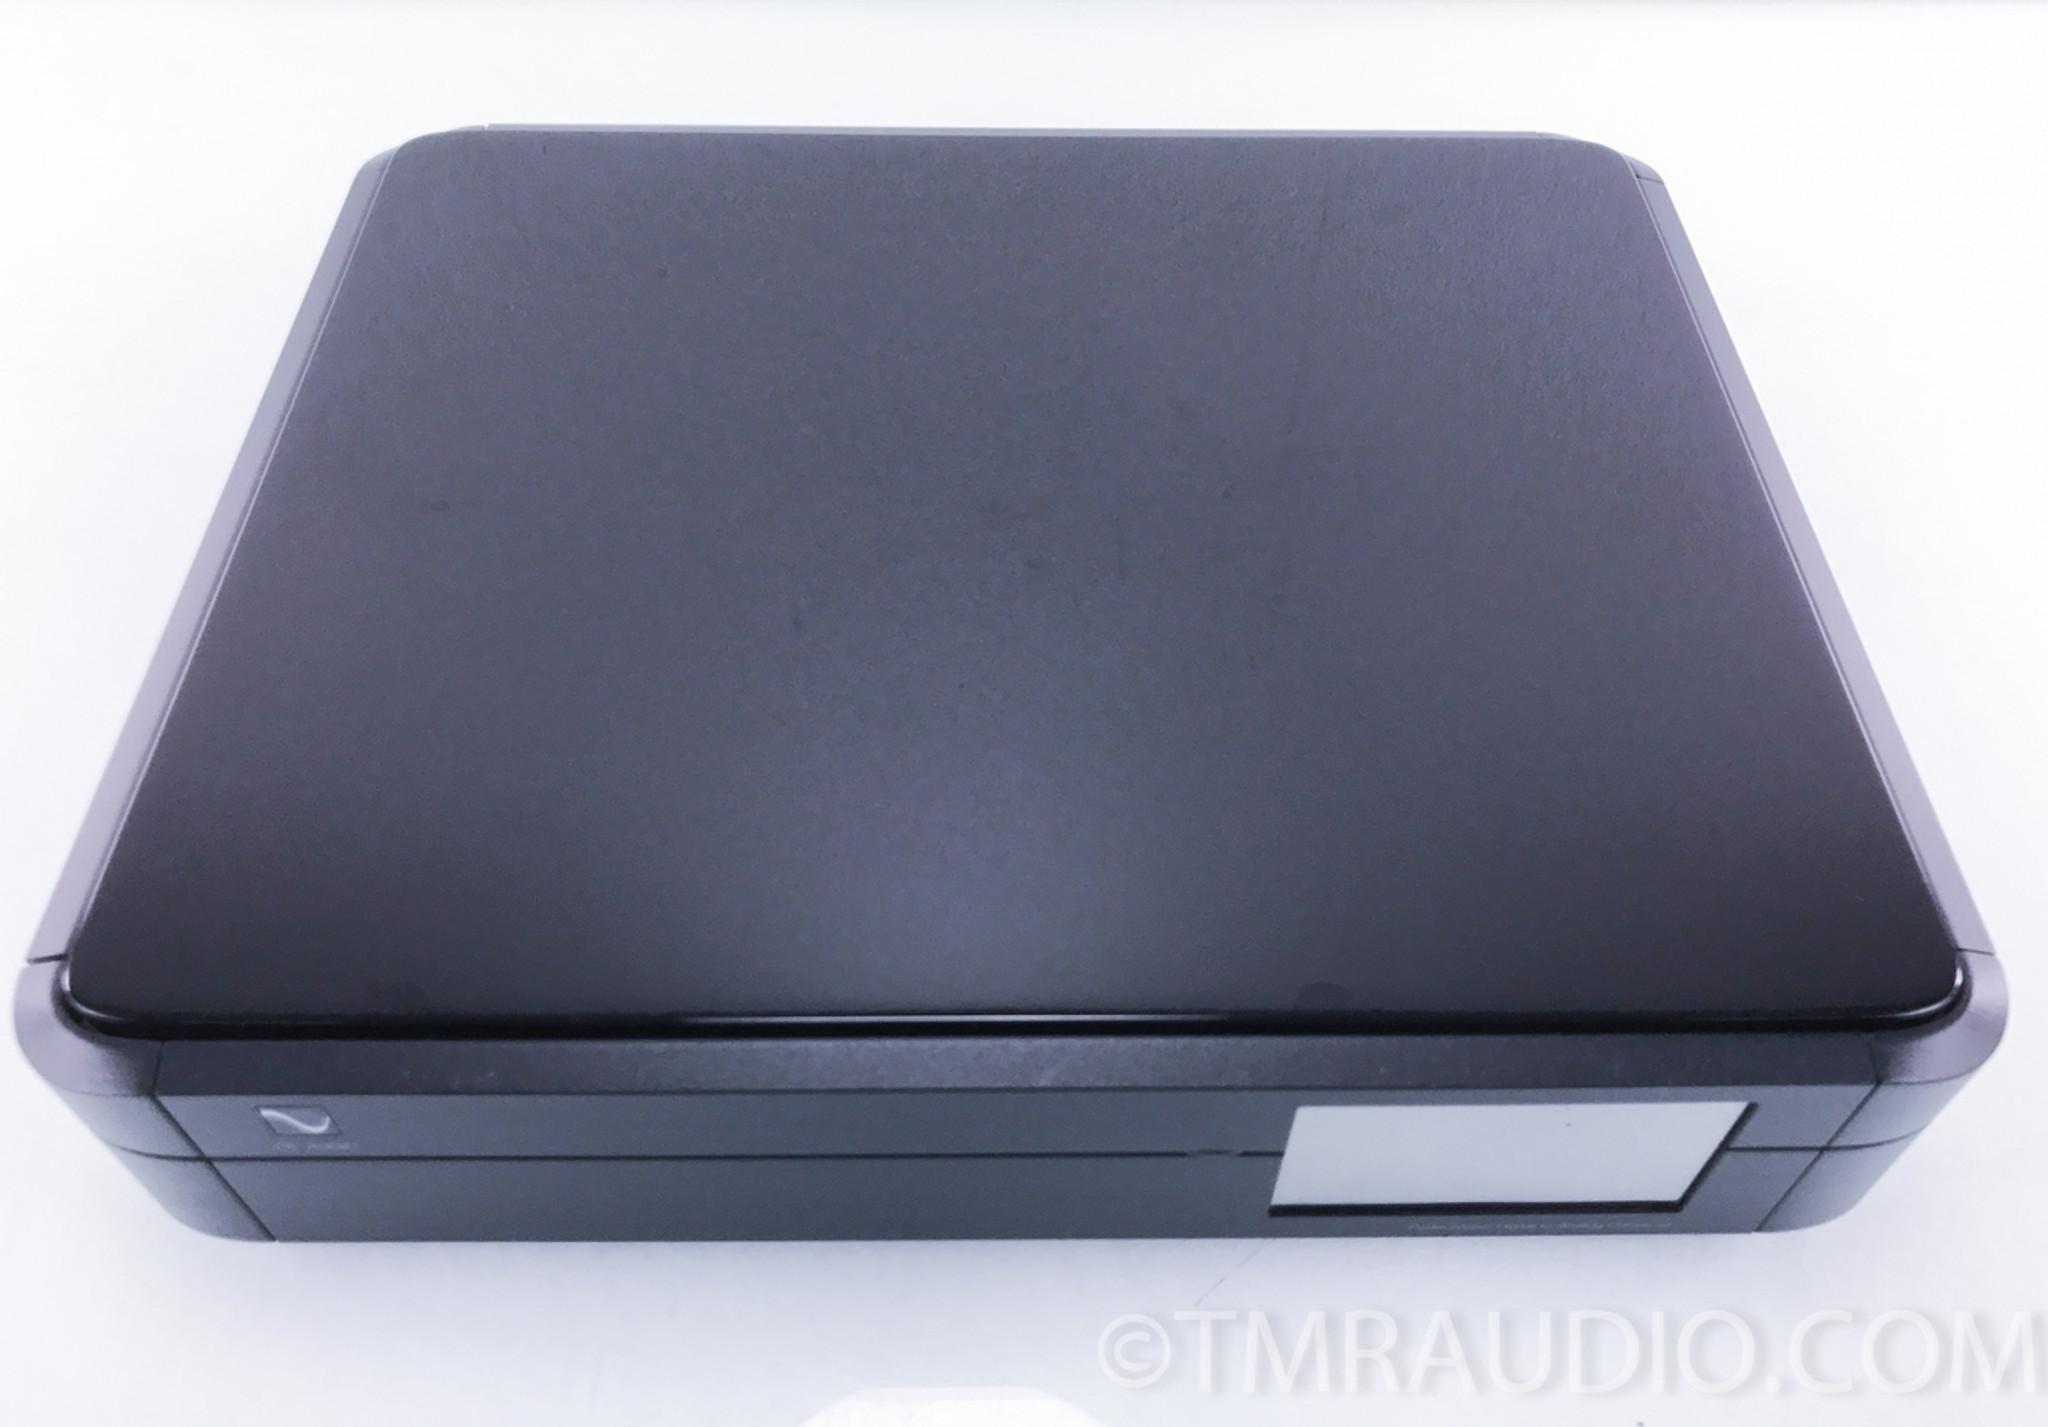 PS Audio PerfectWave DAC II; PWD II D/A Converter